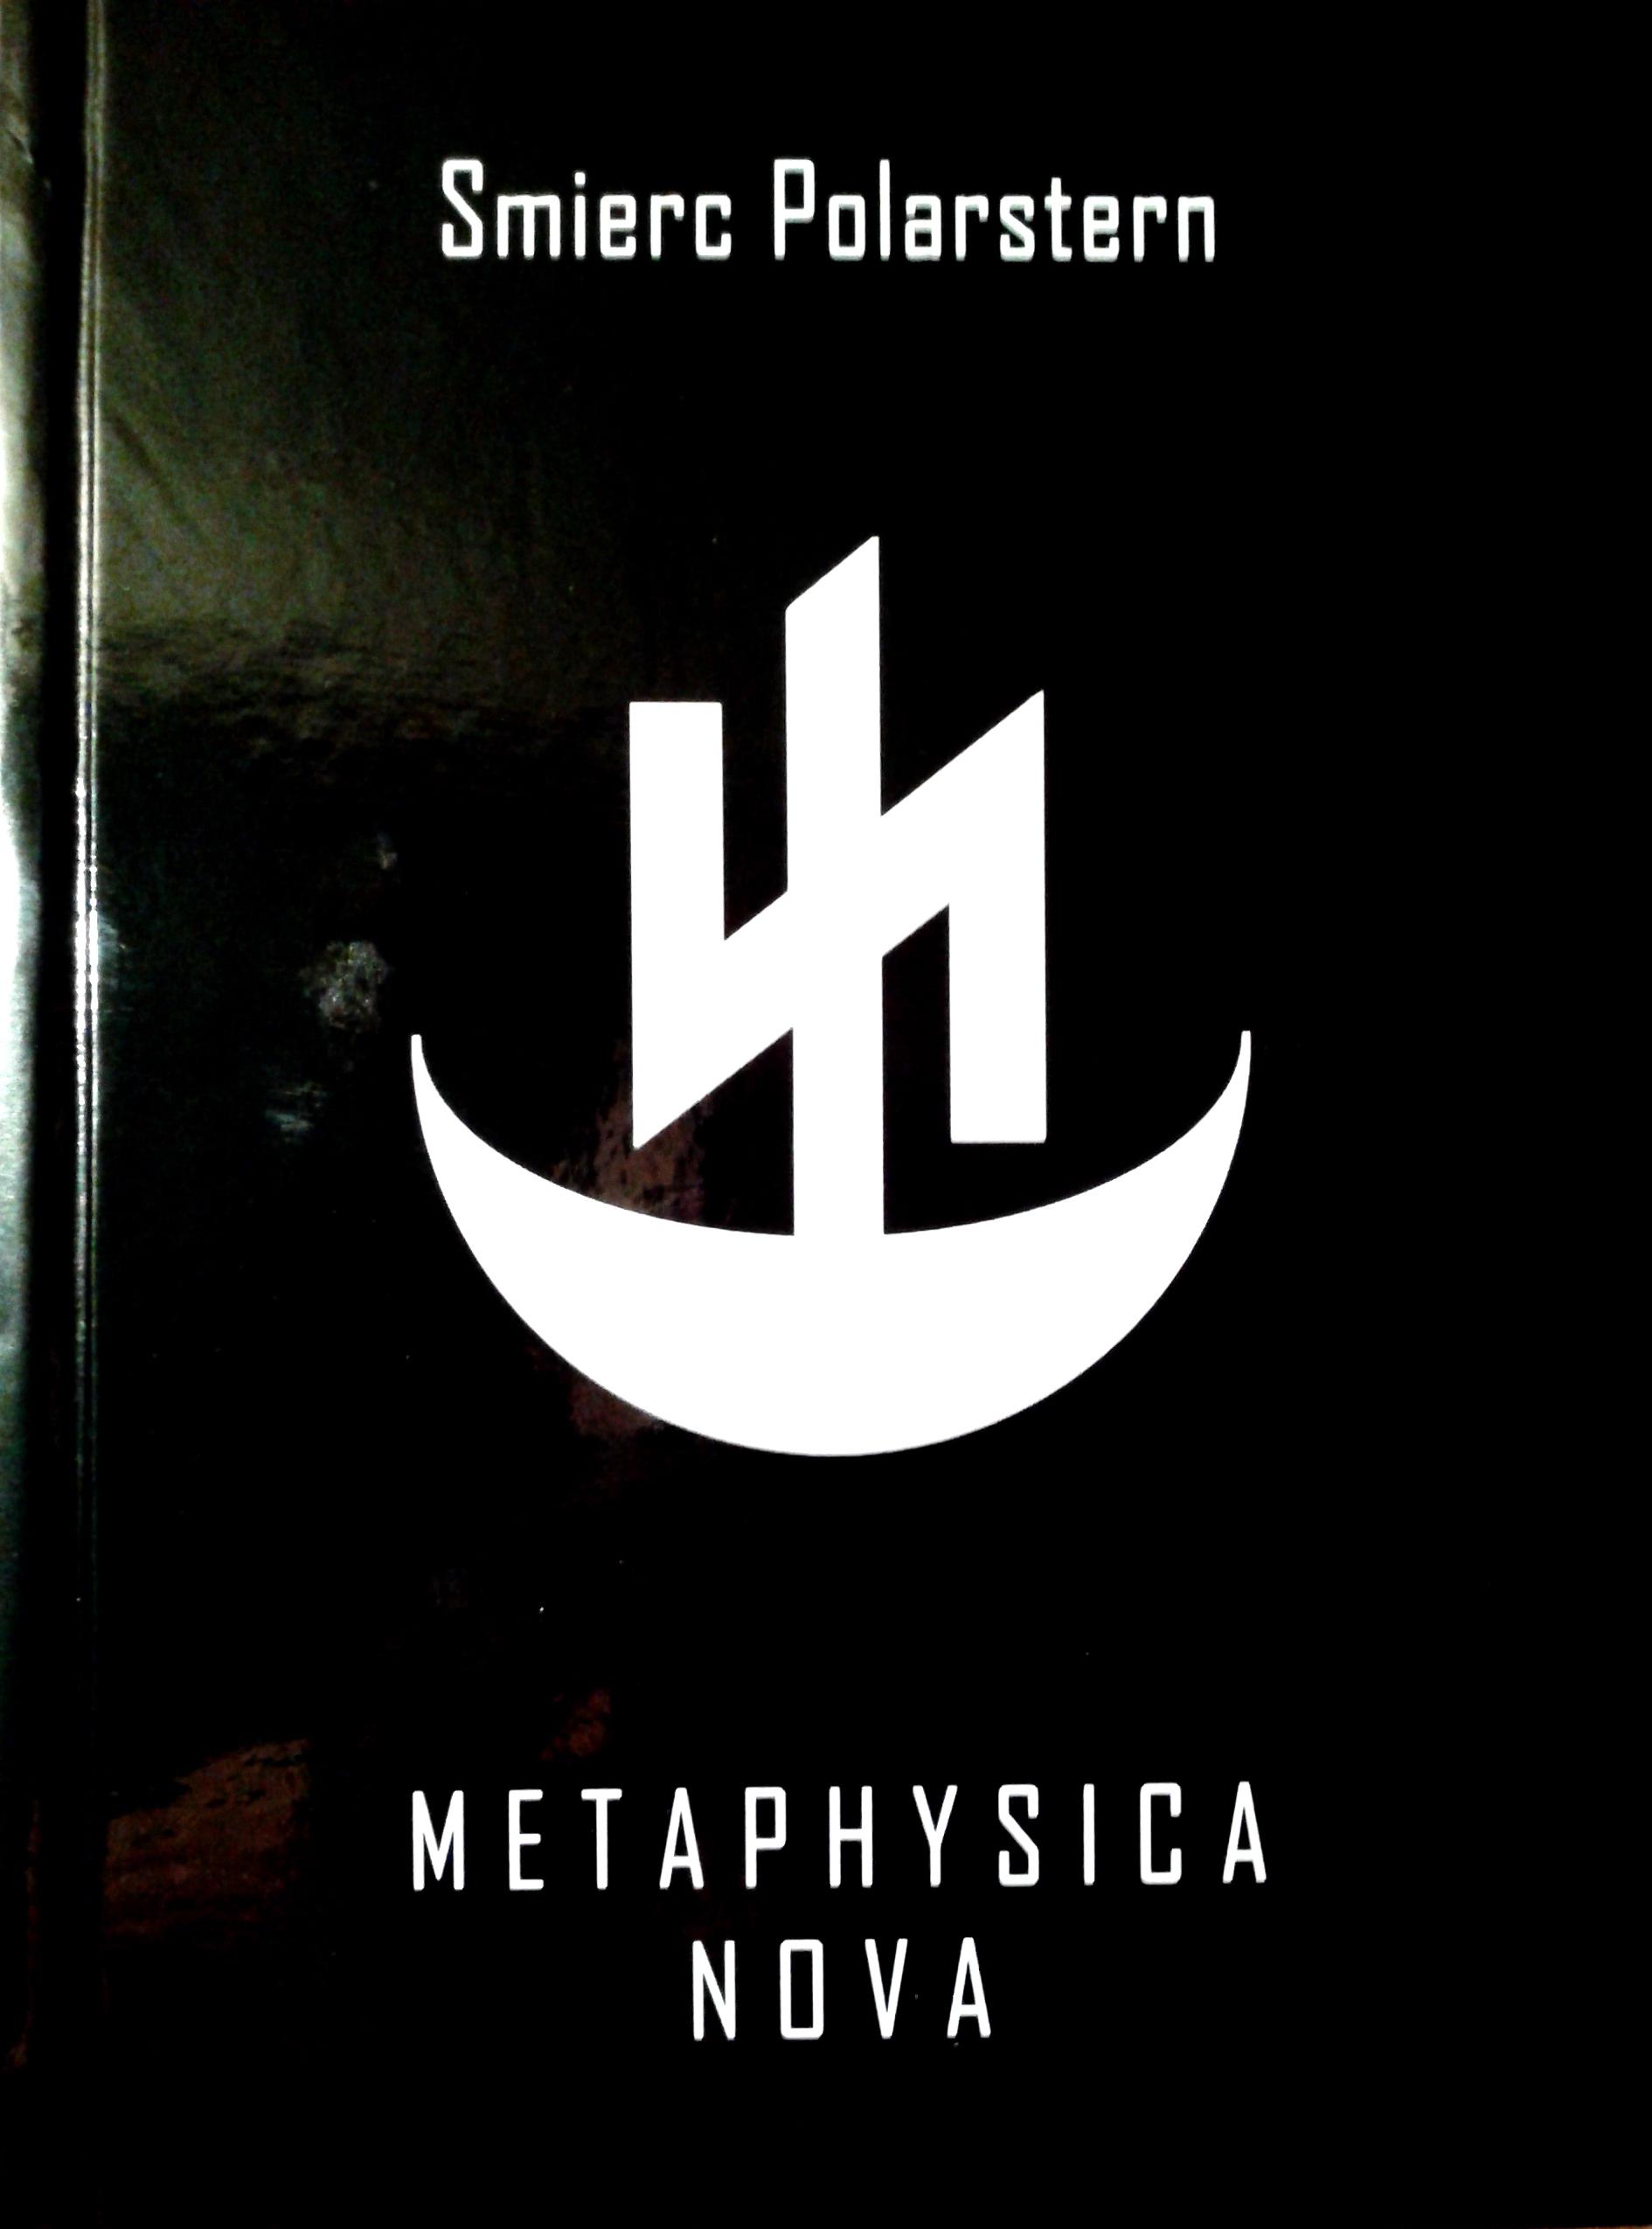 Smierc Polarstern: Metaphysica Nova